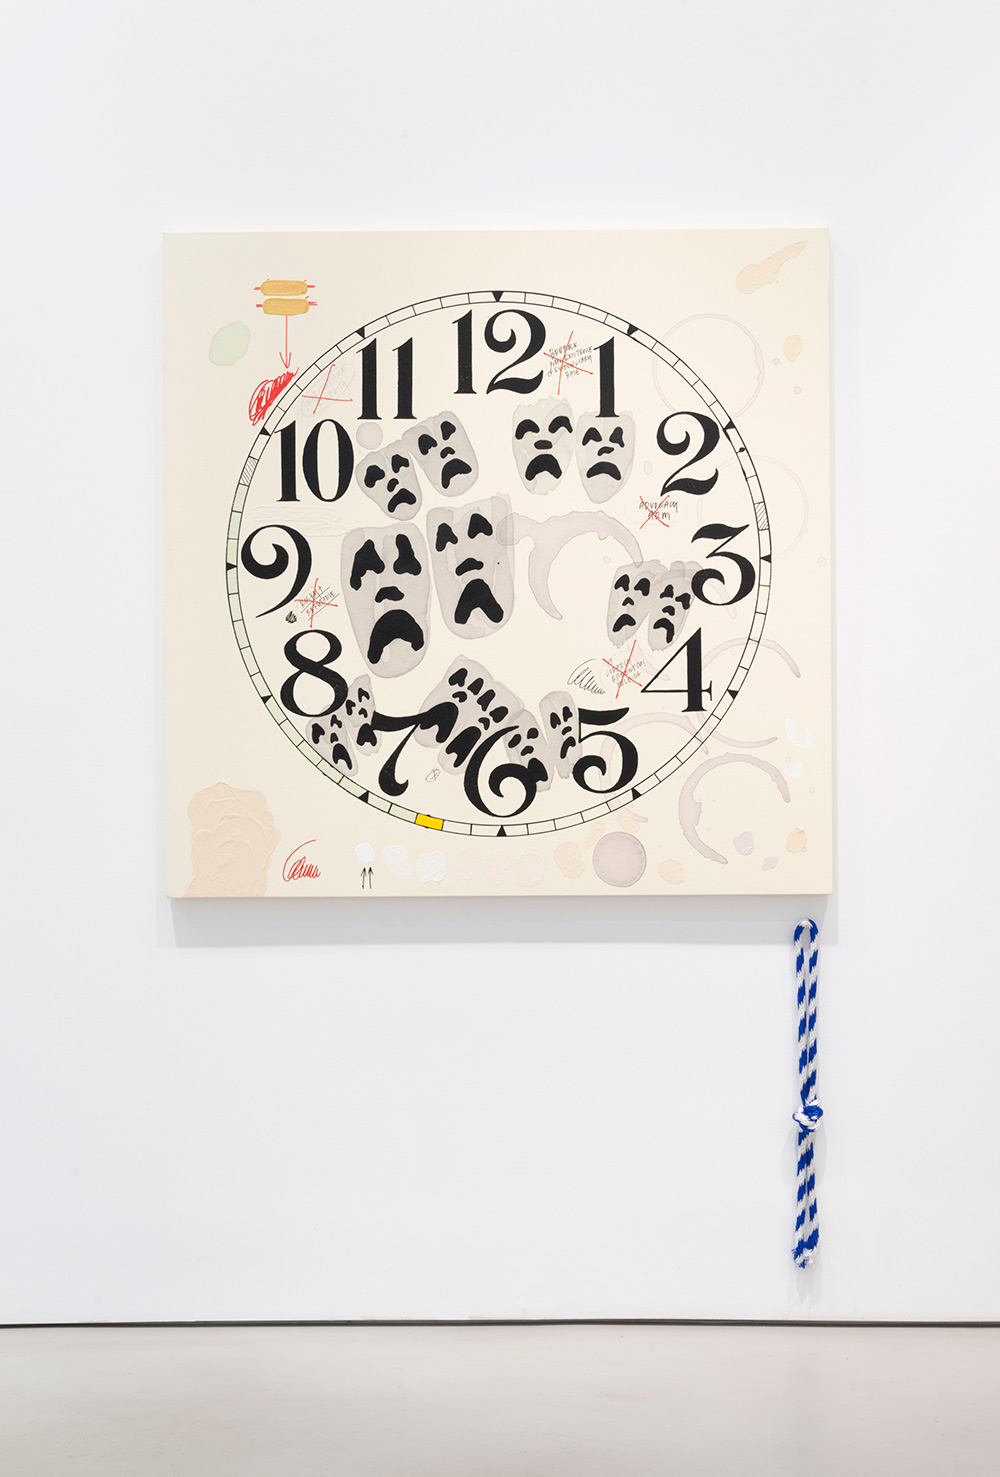 Amanda Ross-Ho, MY PEN IS HUGE . Courtesy of the artist and Mitchell-Innes & Nash, NY.